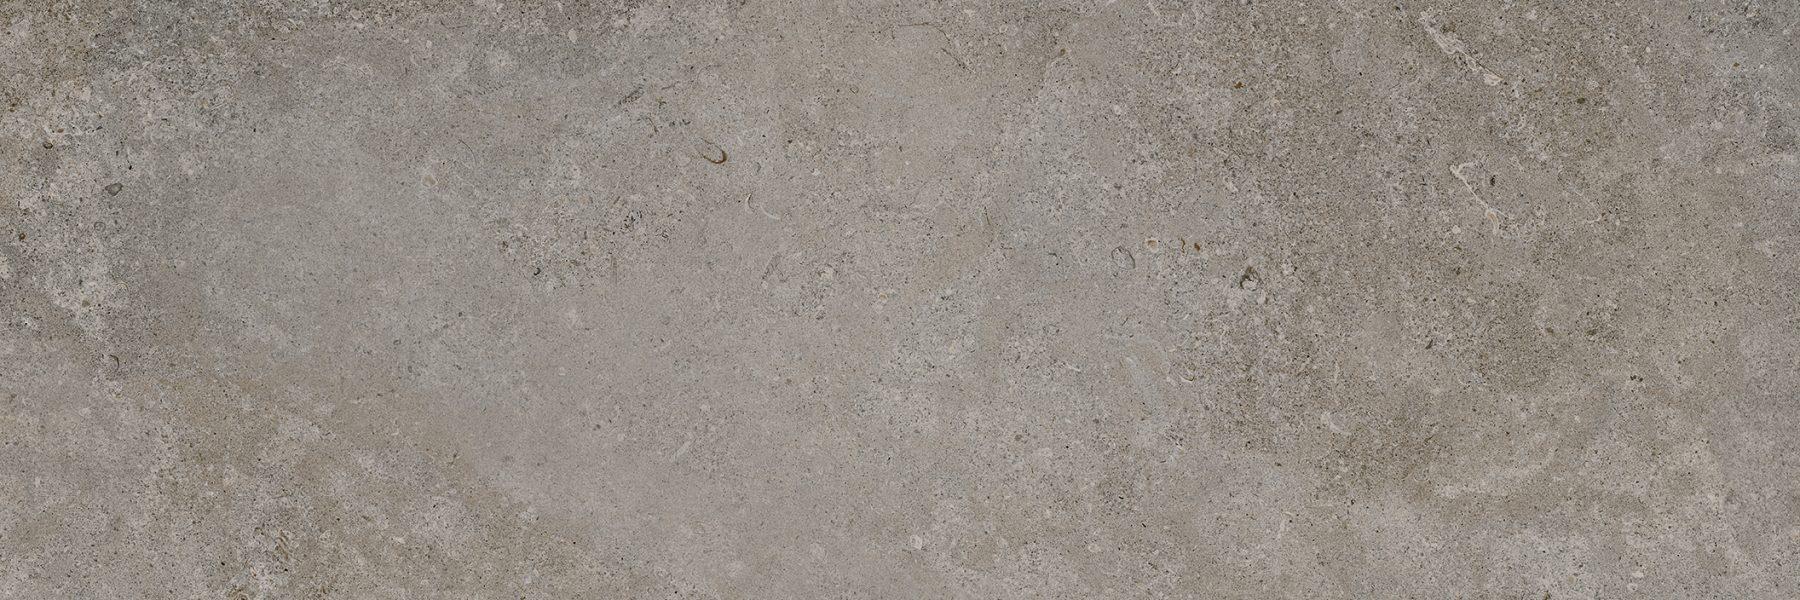 Porcelanosa Mosa-River Topo Tile 59.6 x 180 cm